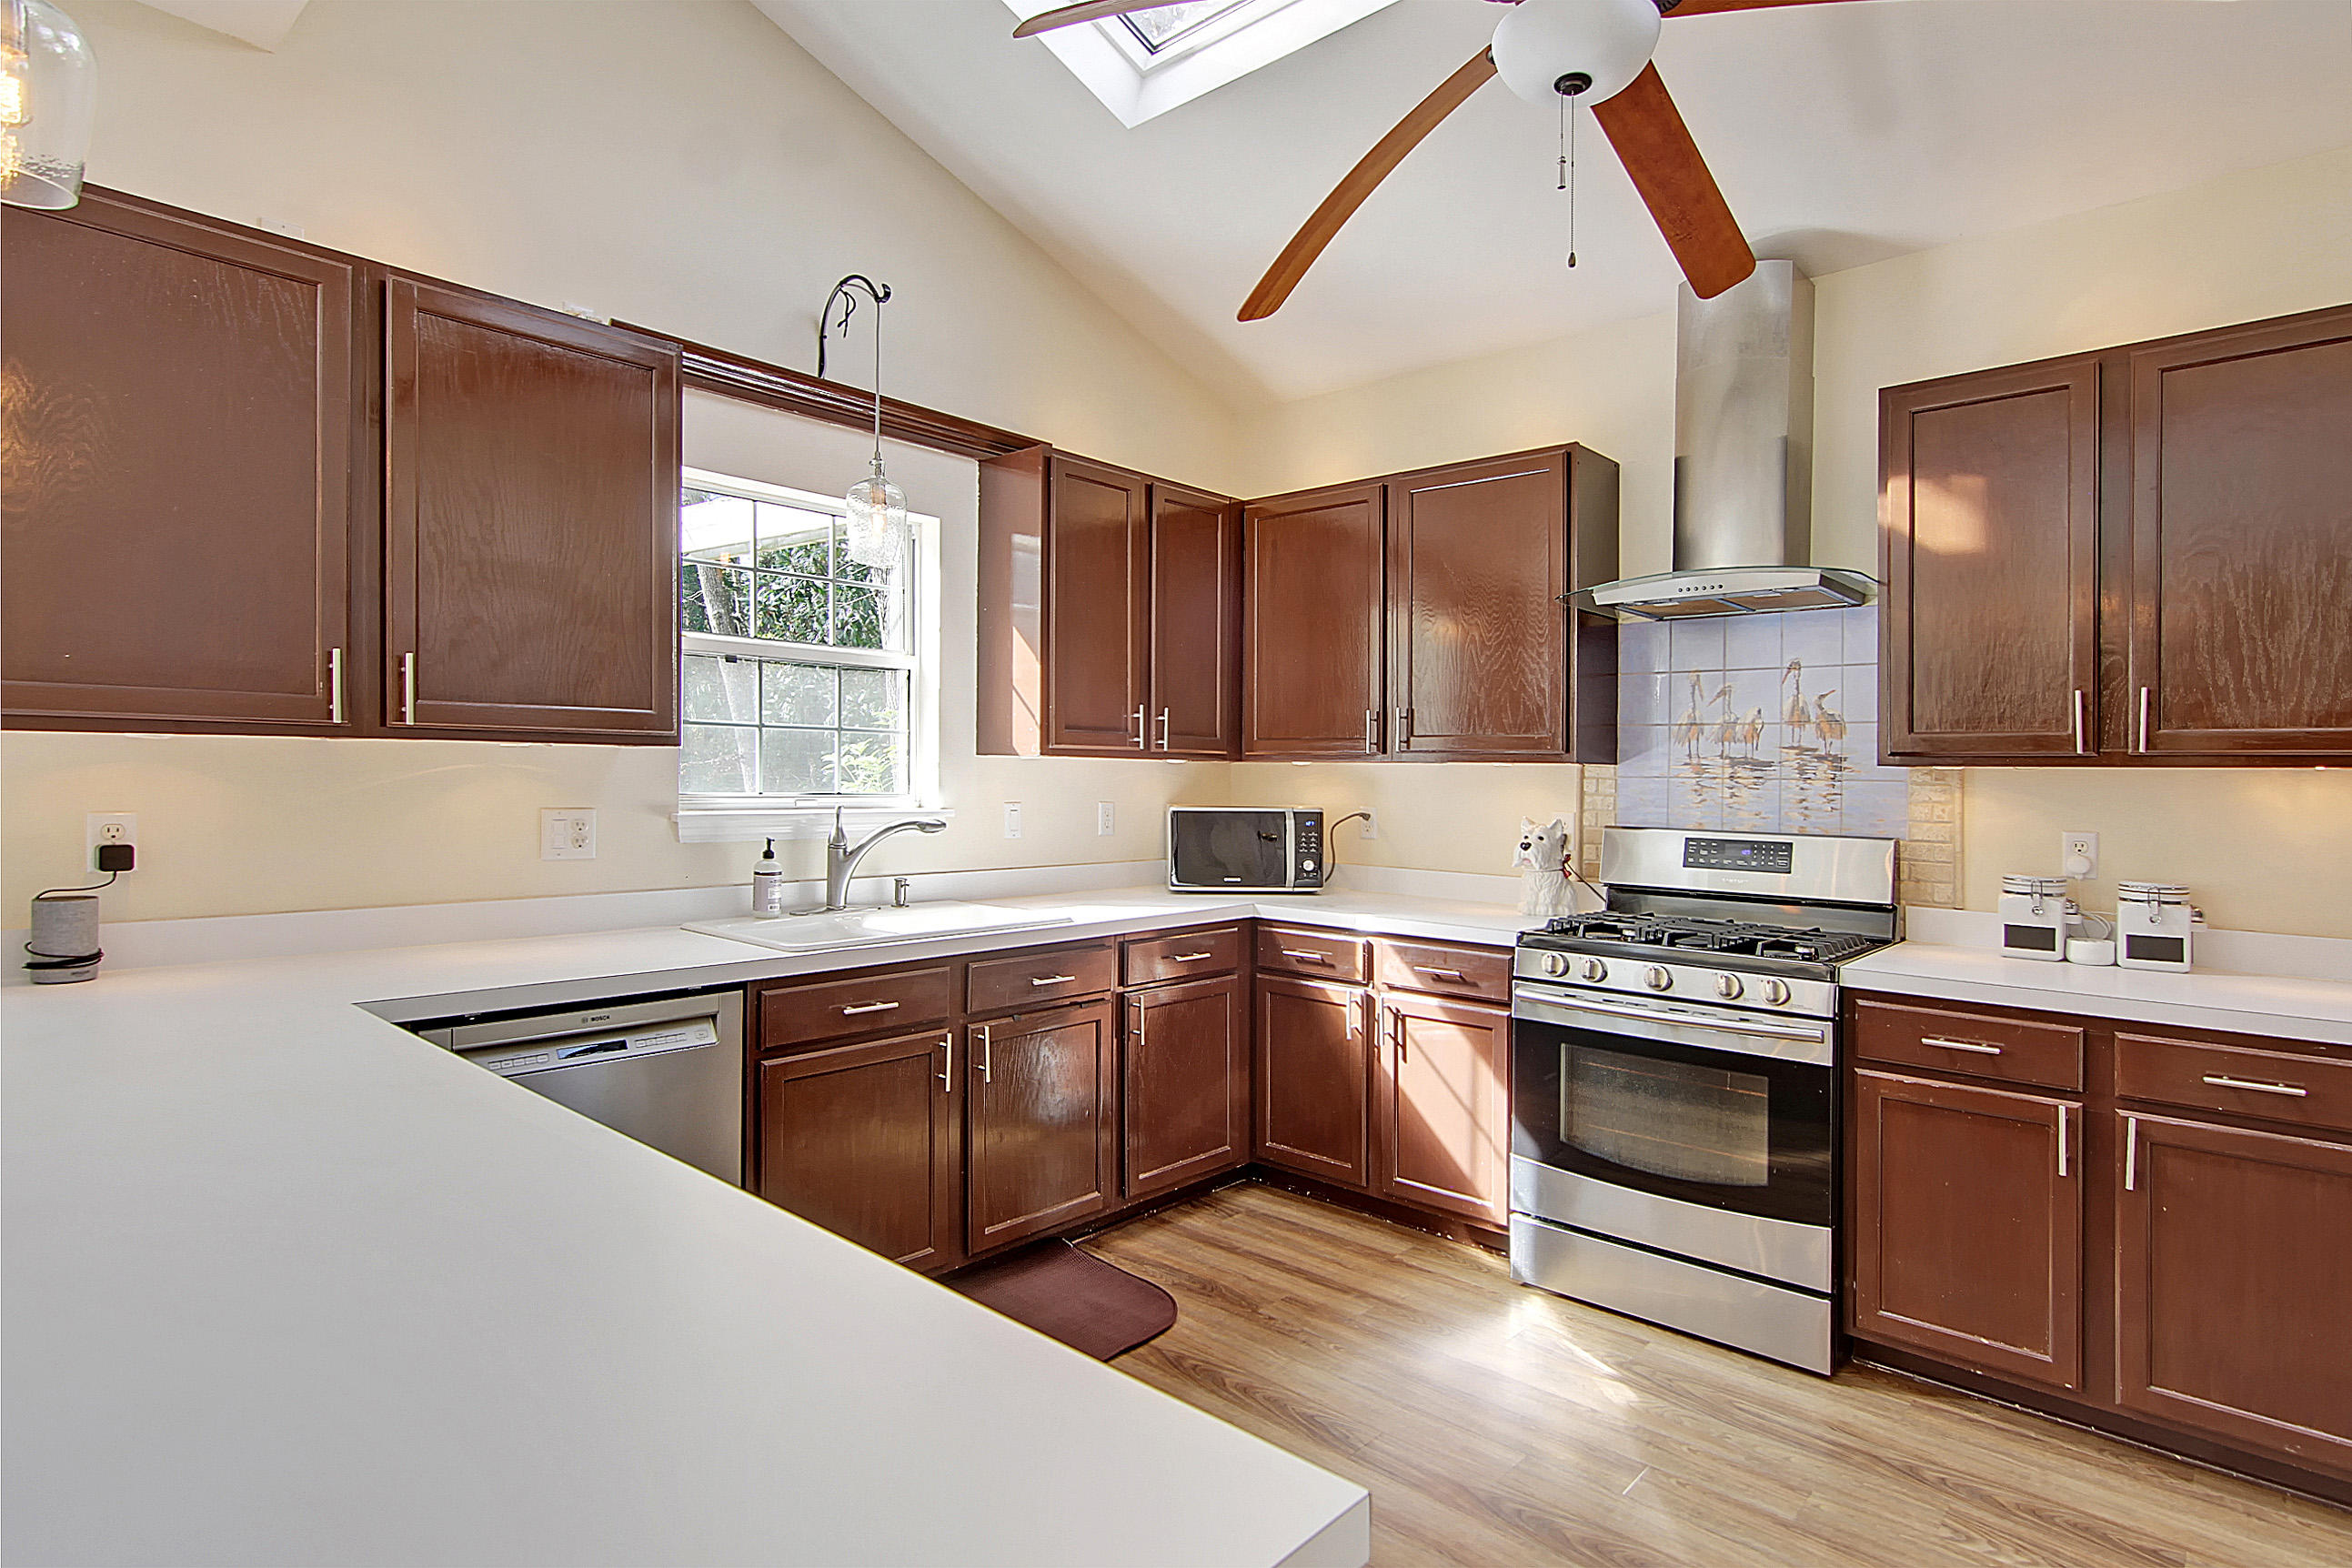 Brickyard Plantation Homes For Sale - 1169 Park View, Mount Pleasant, SC - 26